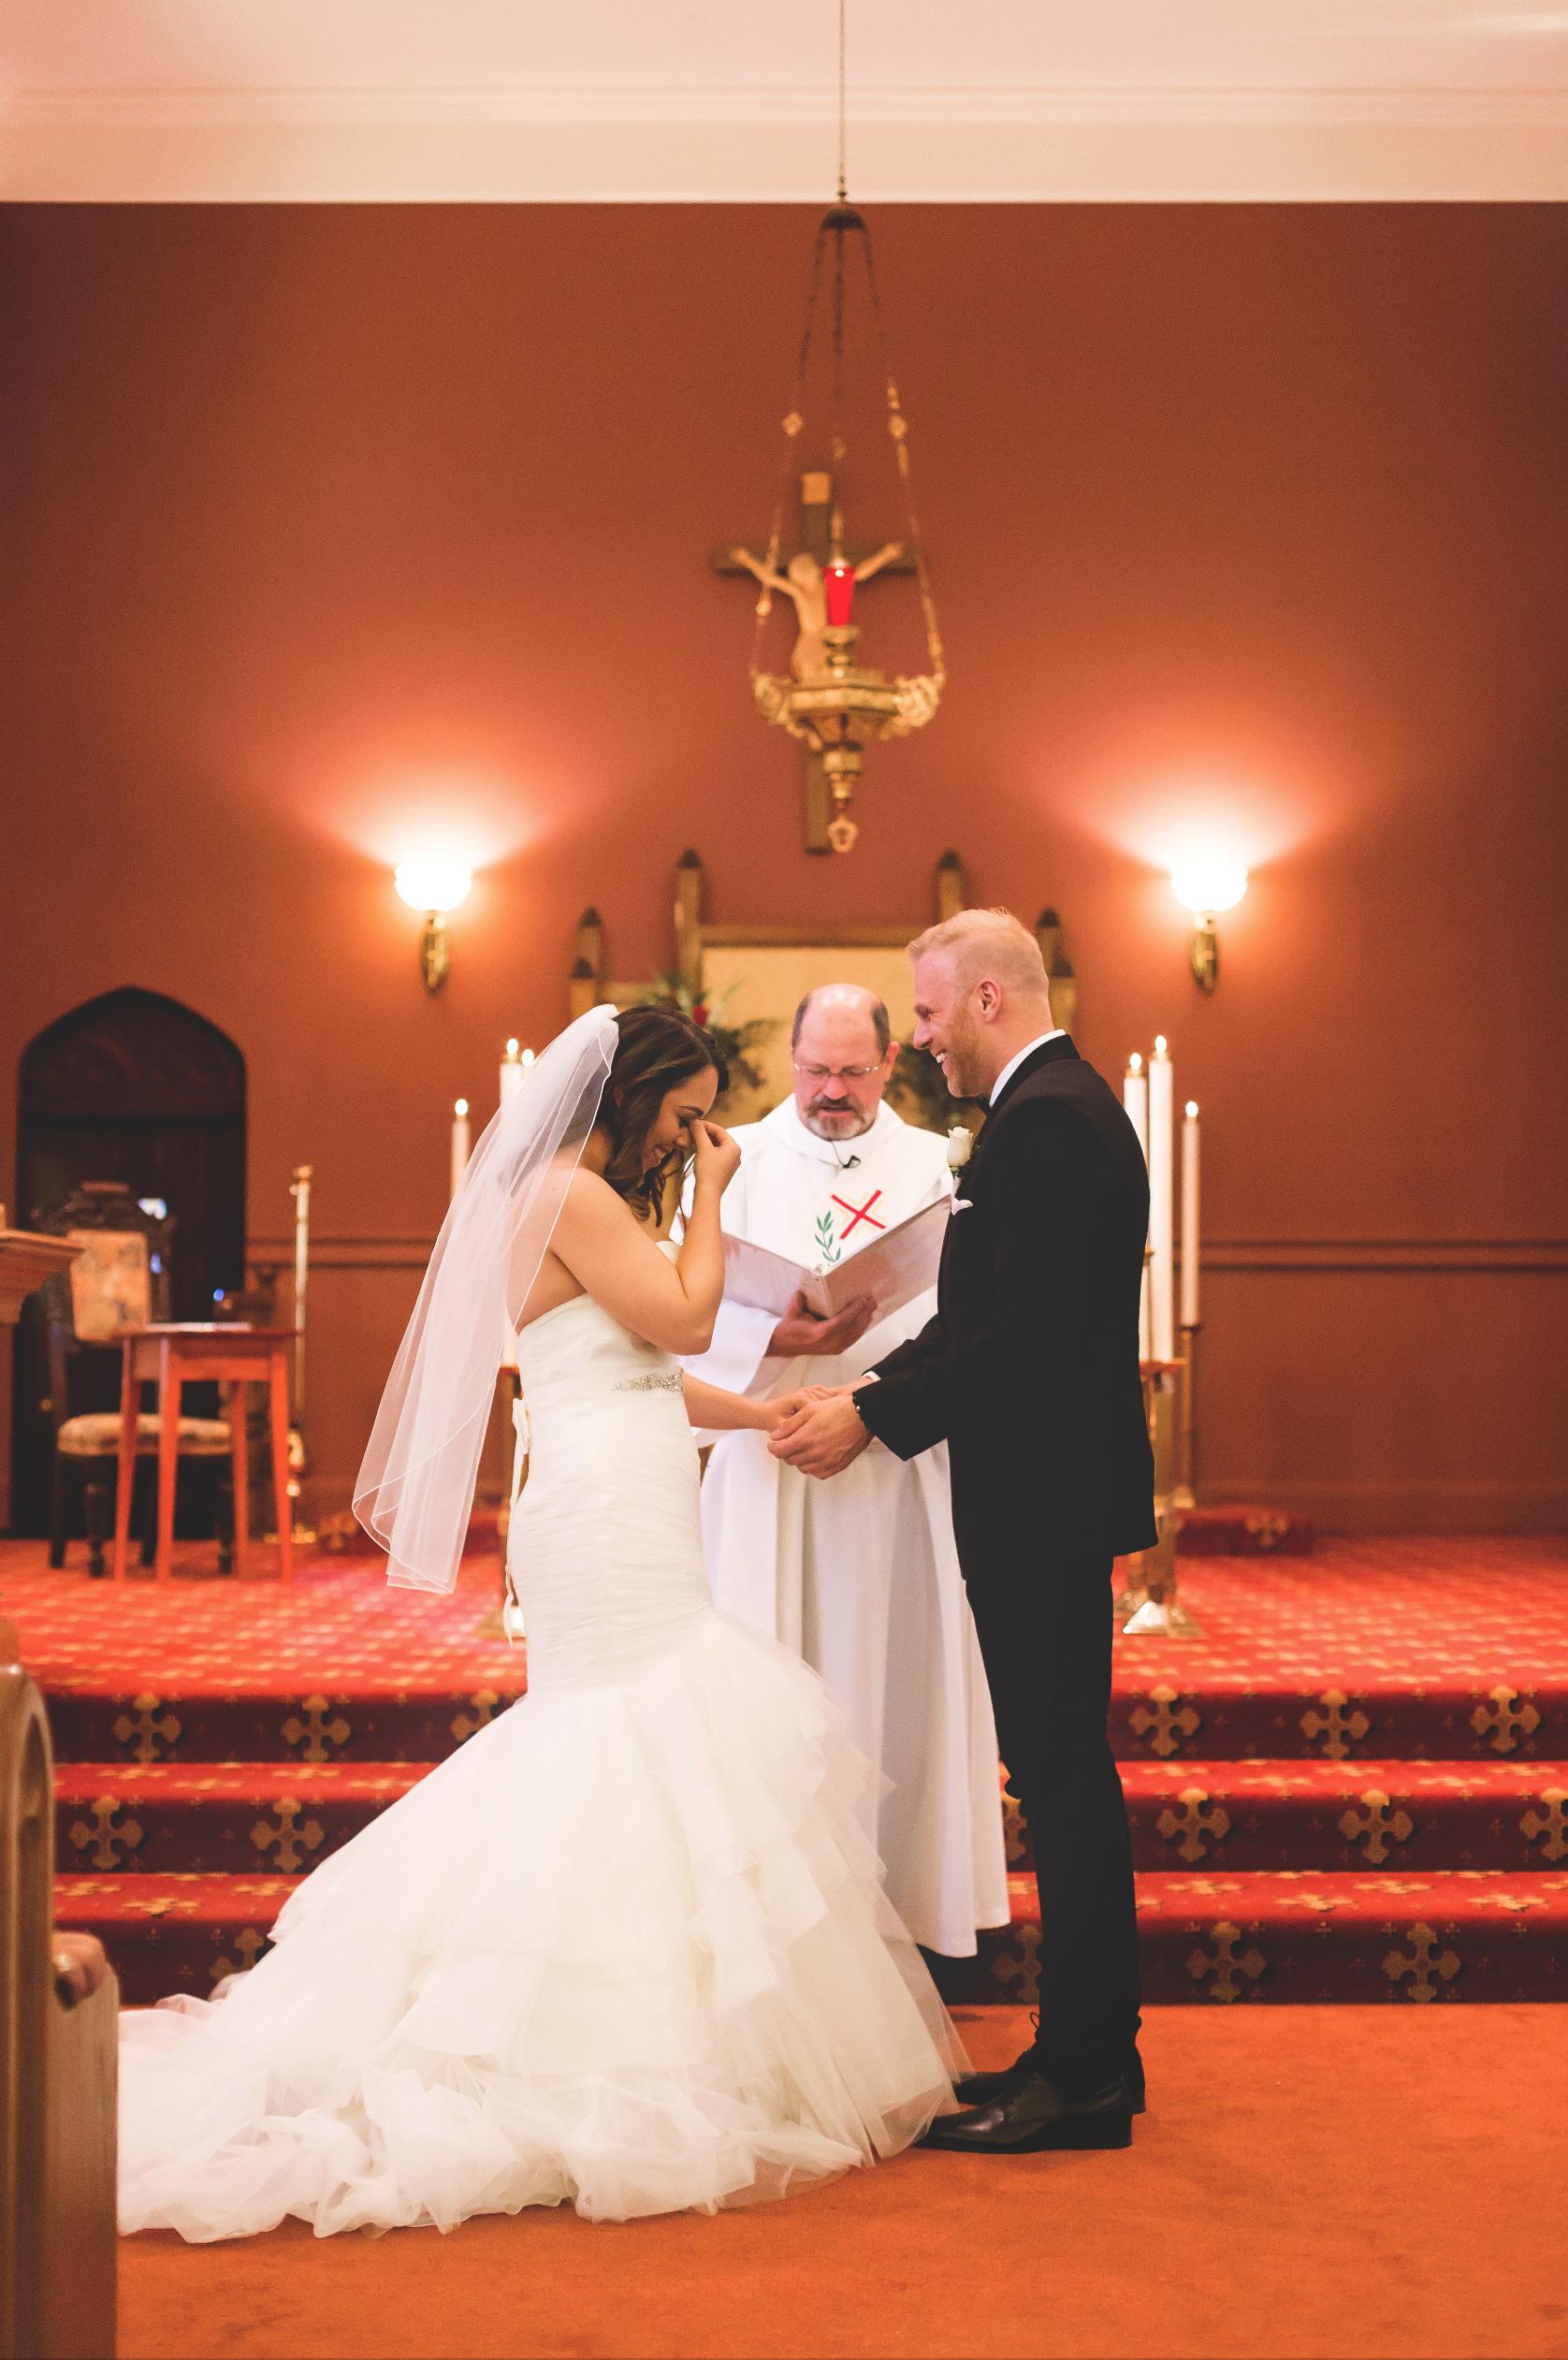 Wedding-Harbour-Banquet-Center-Oakville-Photographer-Wedding-Hamilton-Saint-James-Espresso-Downtown-HamOnt-GTA-Niagara-Toronto-Moments-by-Lauren-Photography-Photo-Image-16.png